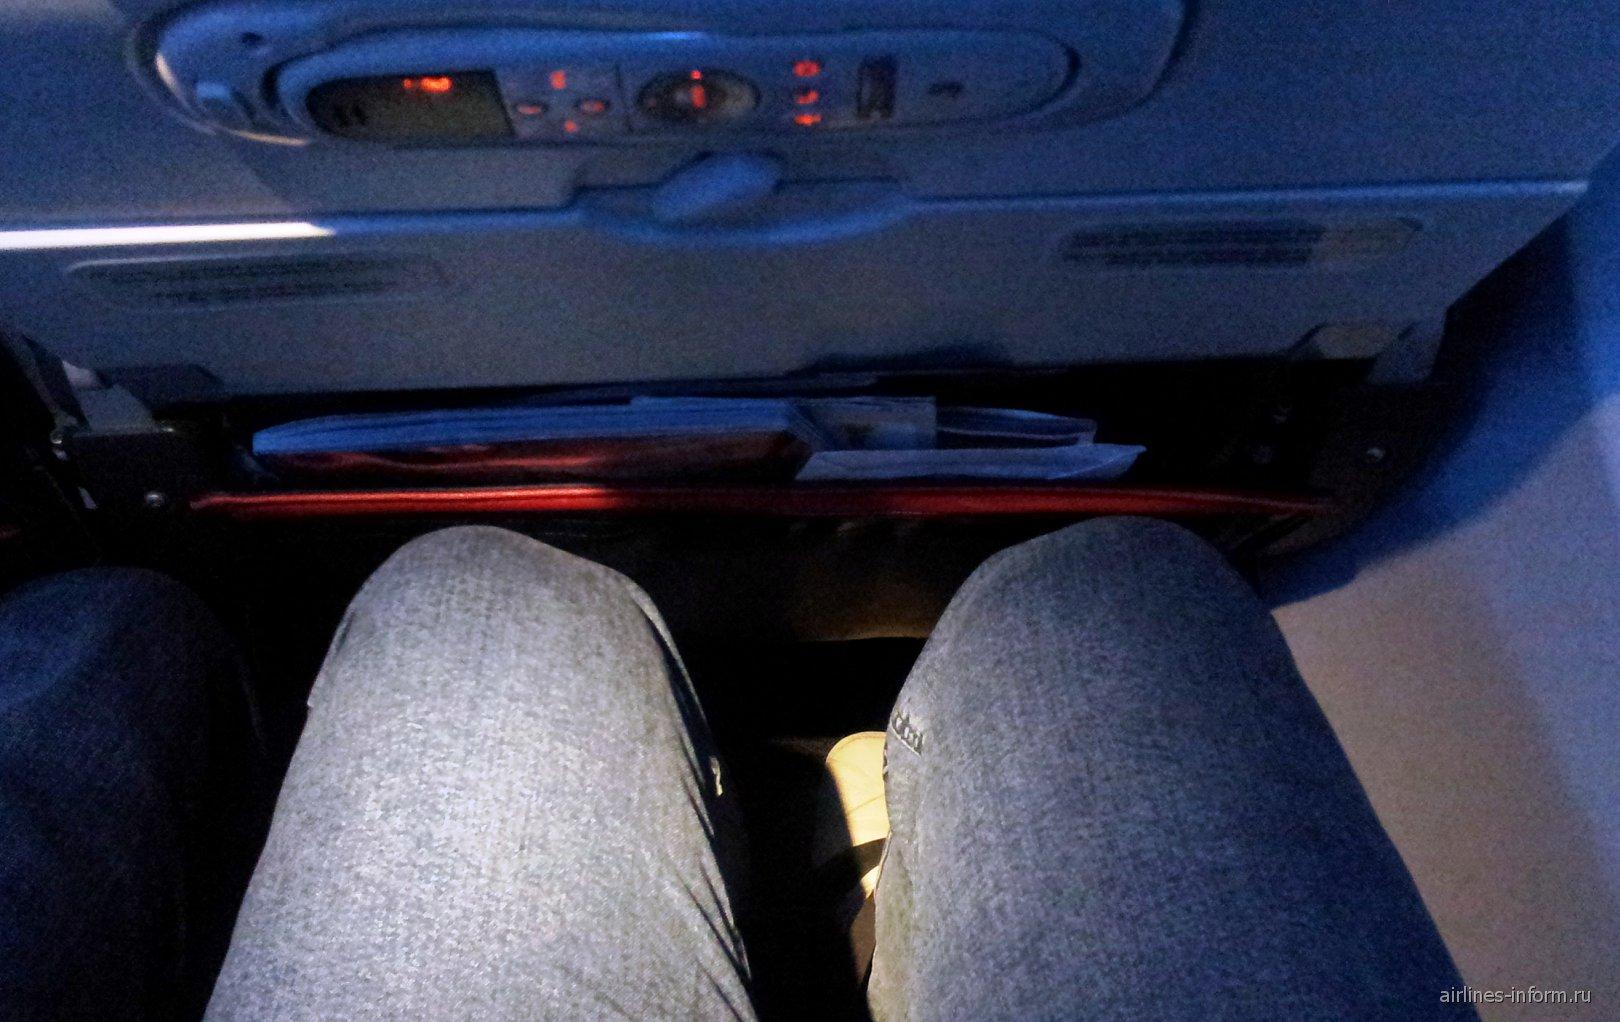 Место для ног в самолете Боинг-737-800 Турецких авиалиний